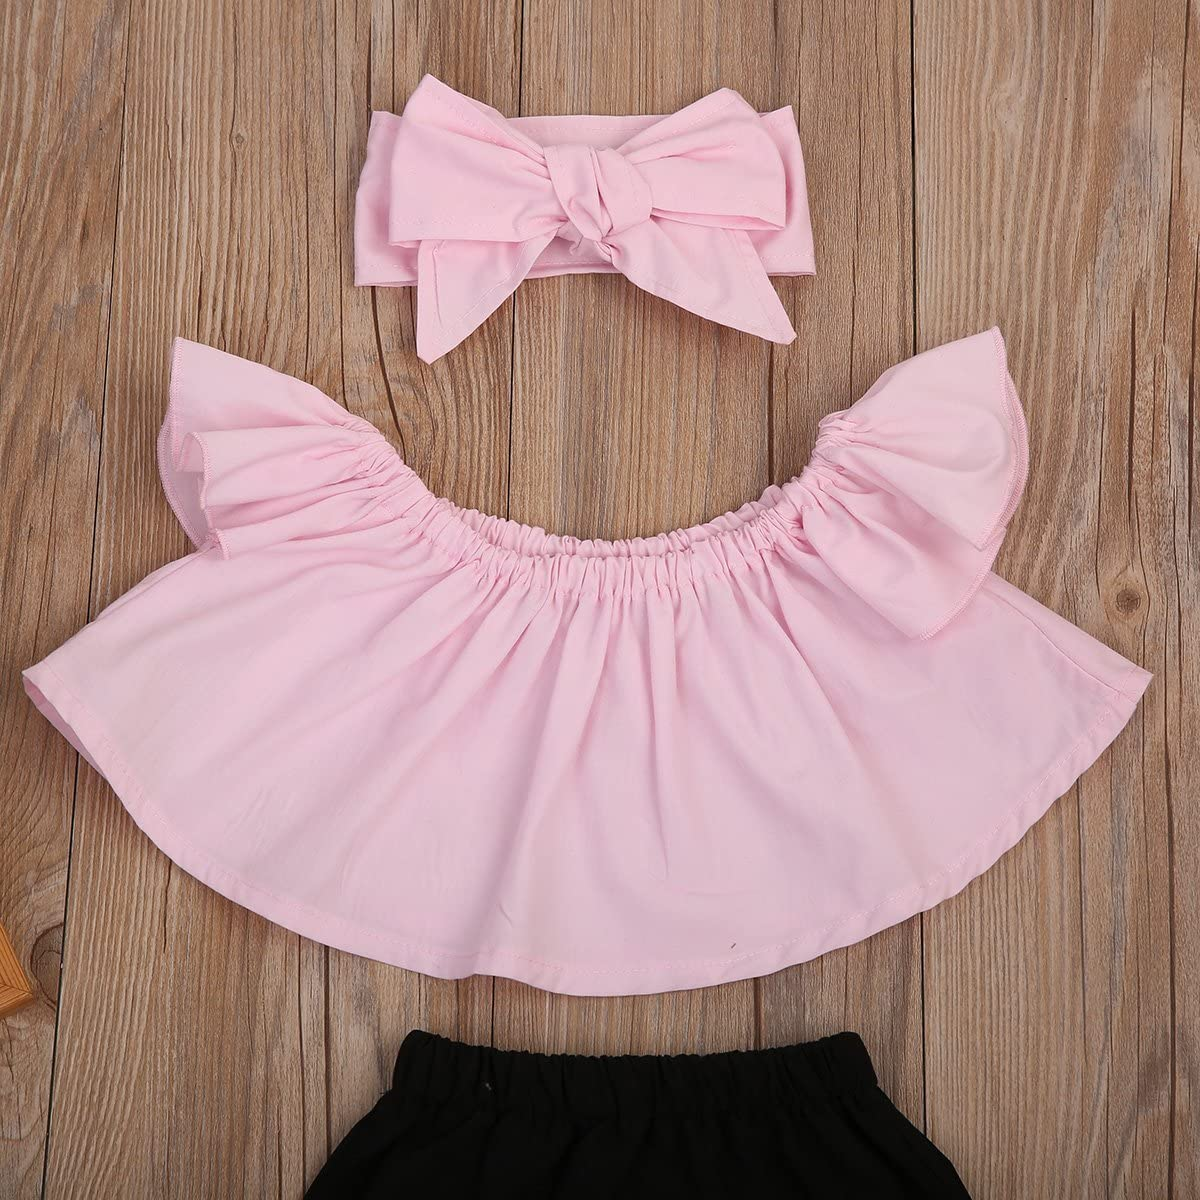 Happy Town Clearance Cute Baby Girls Short Sleeve Blouse Tube Top+High Waist Pom Pom Short Pants